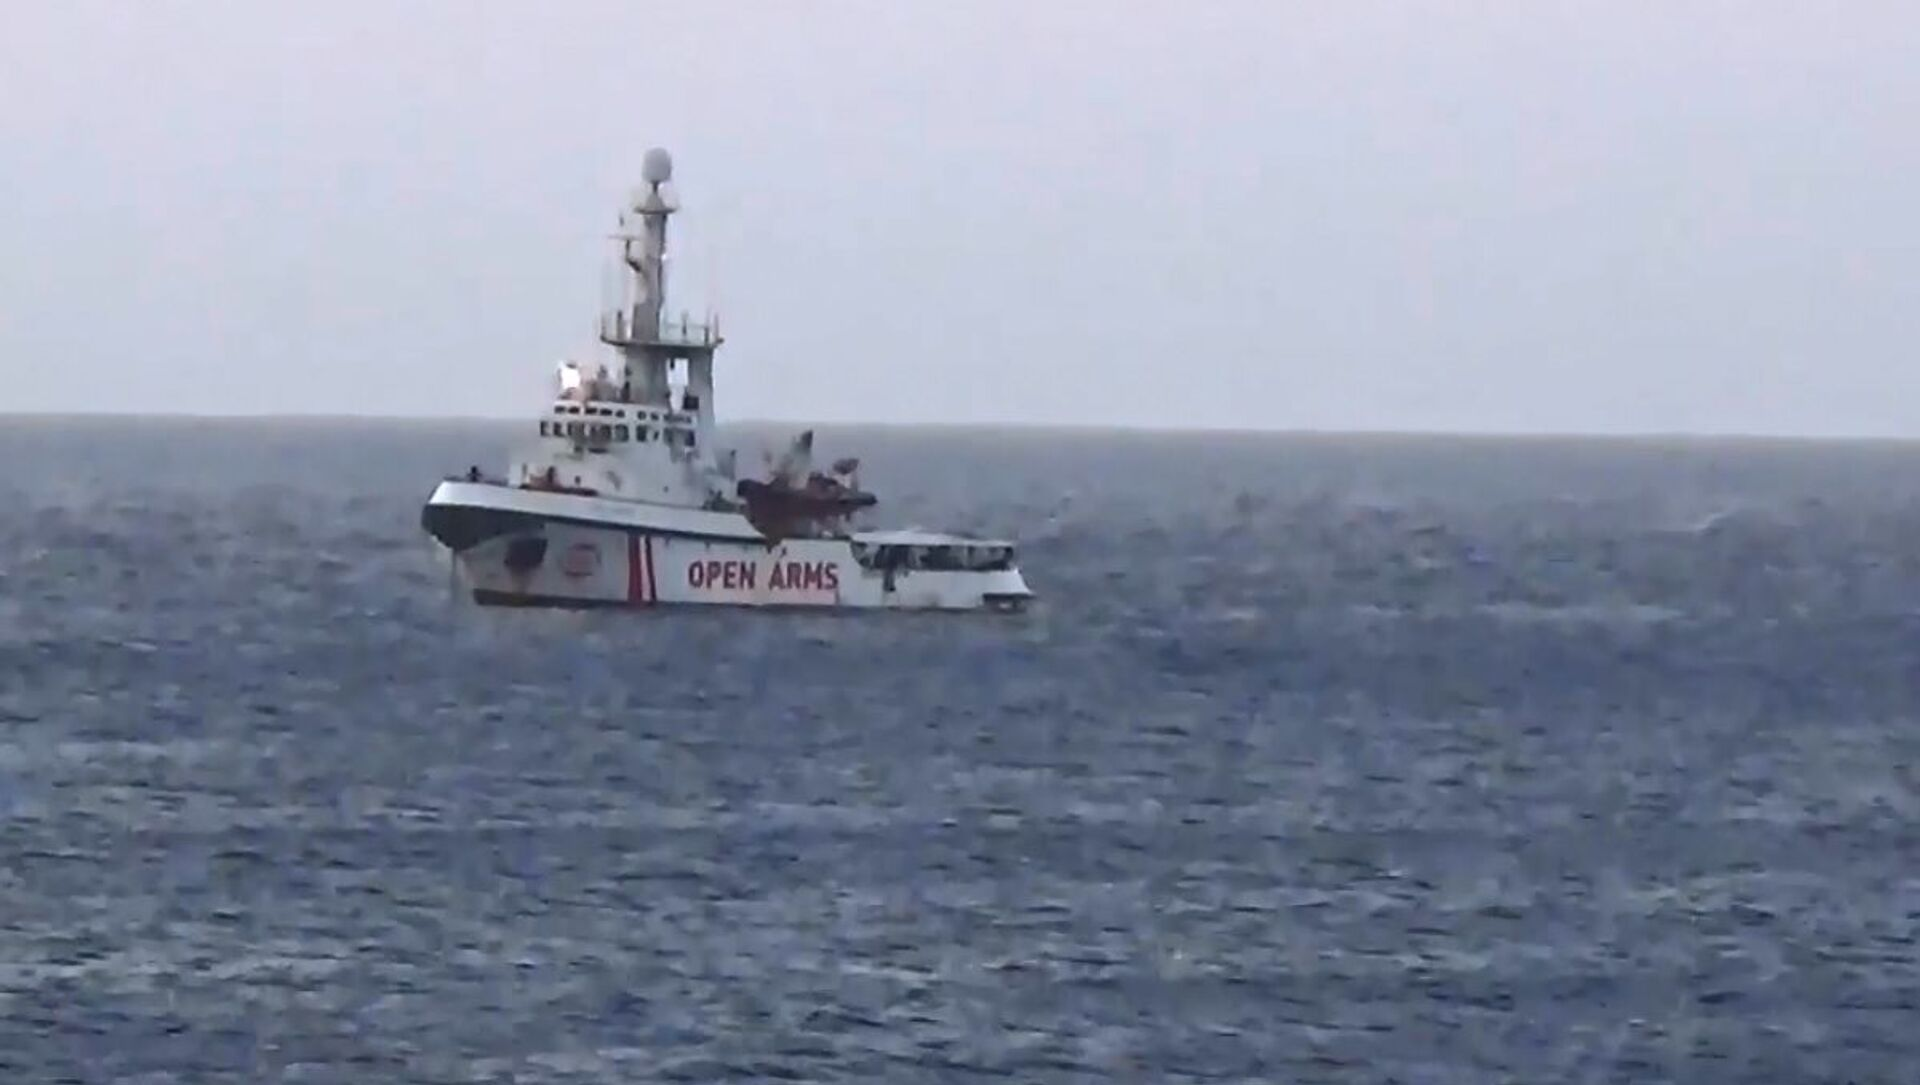 La nave Ong 'Open Arms' si dirige verso Lampedusa  - Sputnik Italia, 1920, 18.04.2021